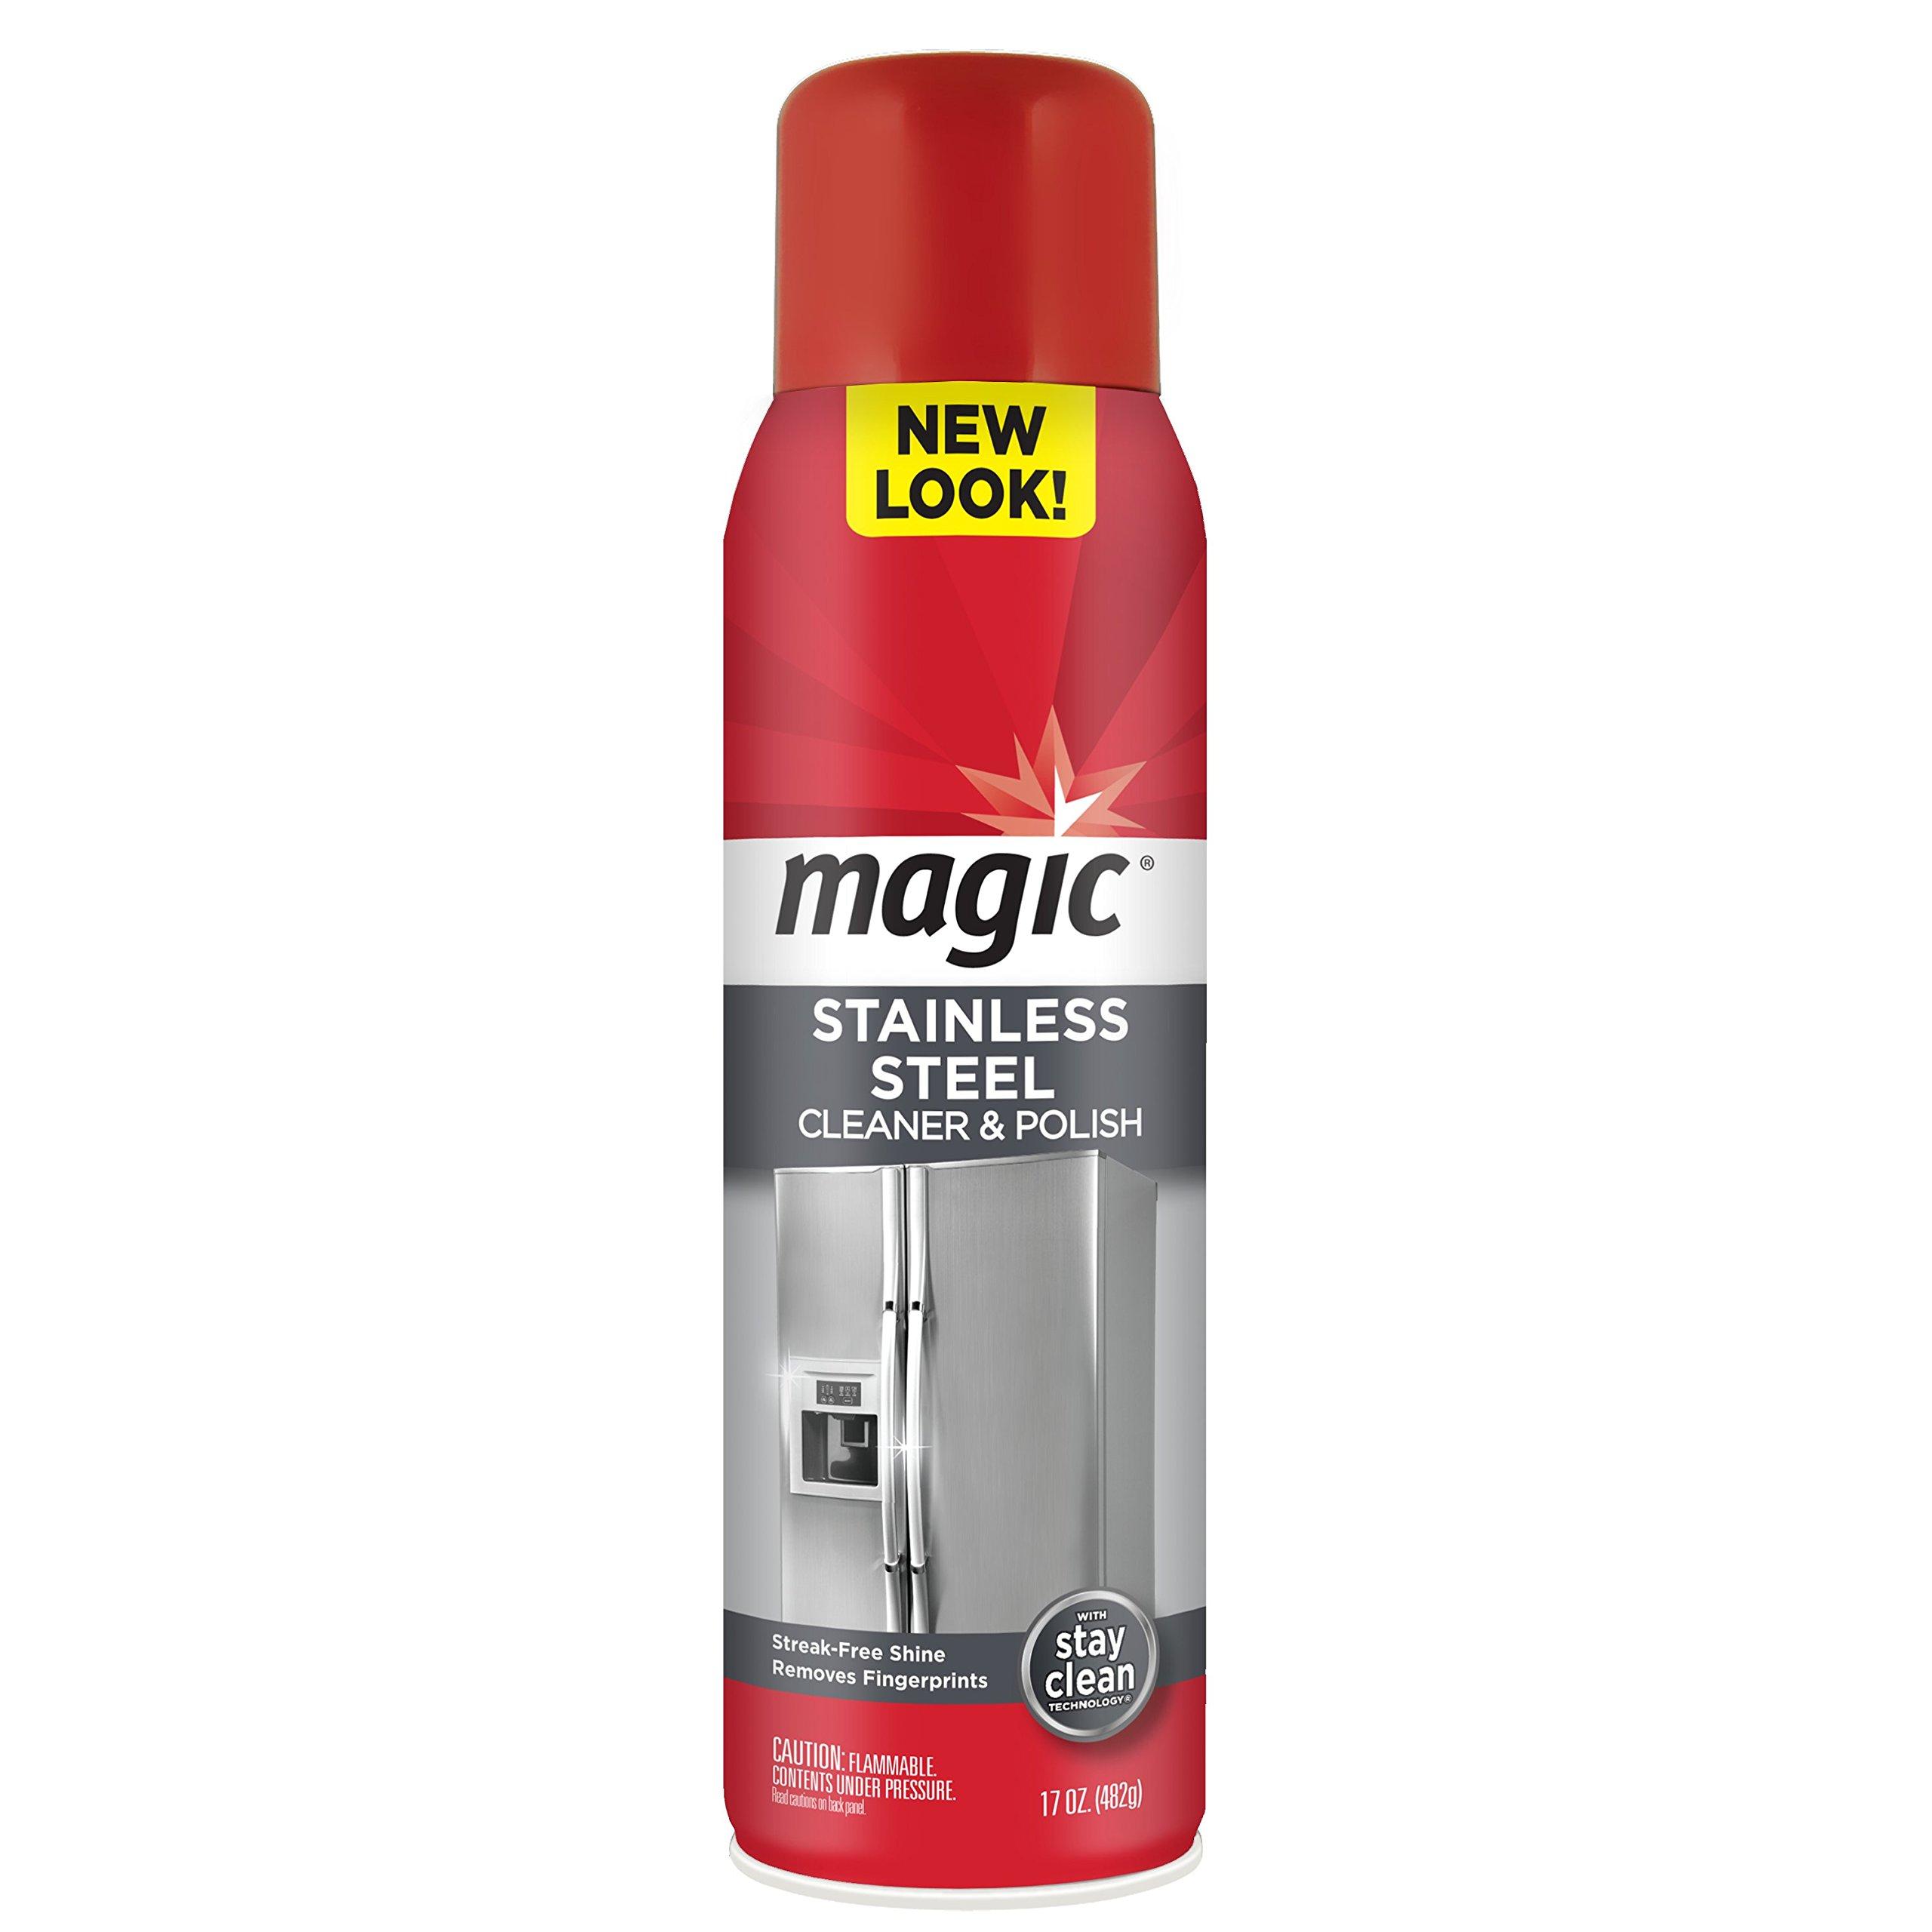 Amazon.com: Magic Stainless Steel Cleaner & Polish Trigger Spray ...